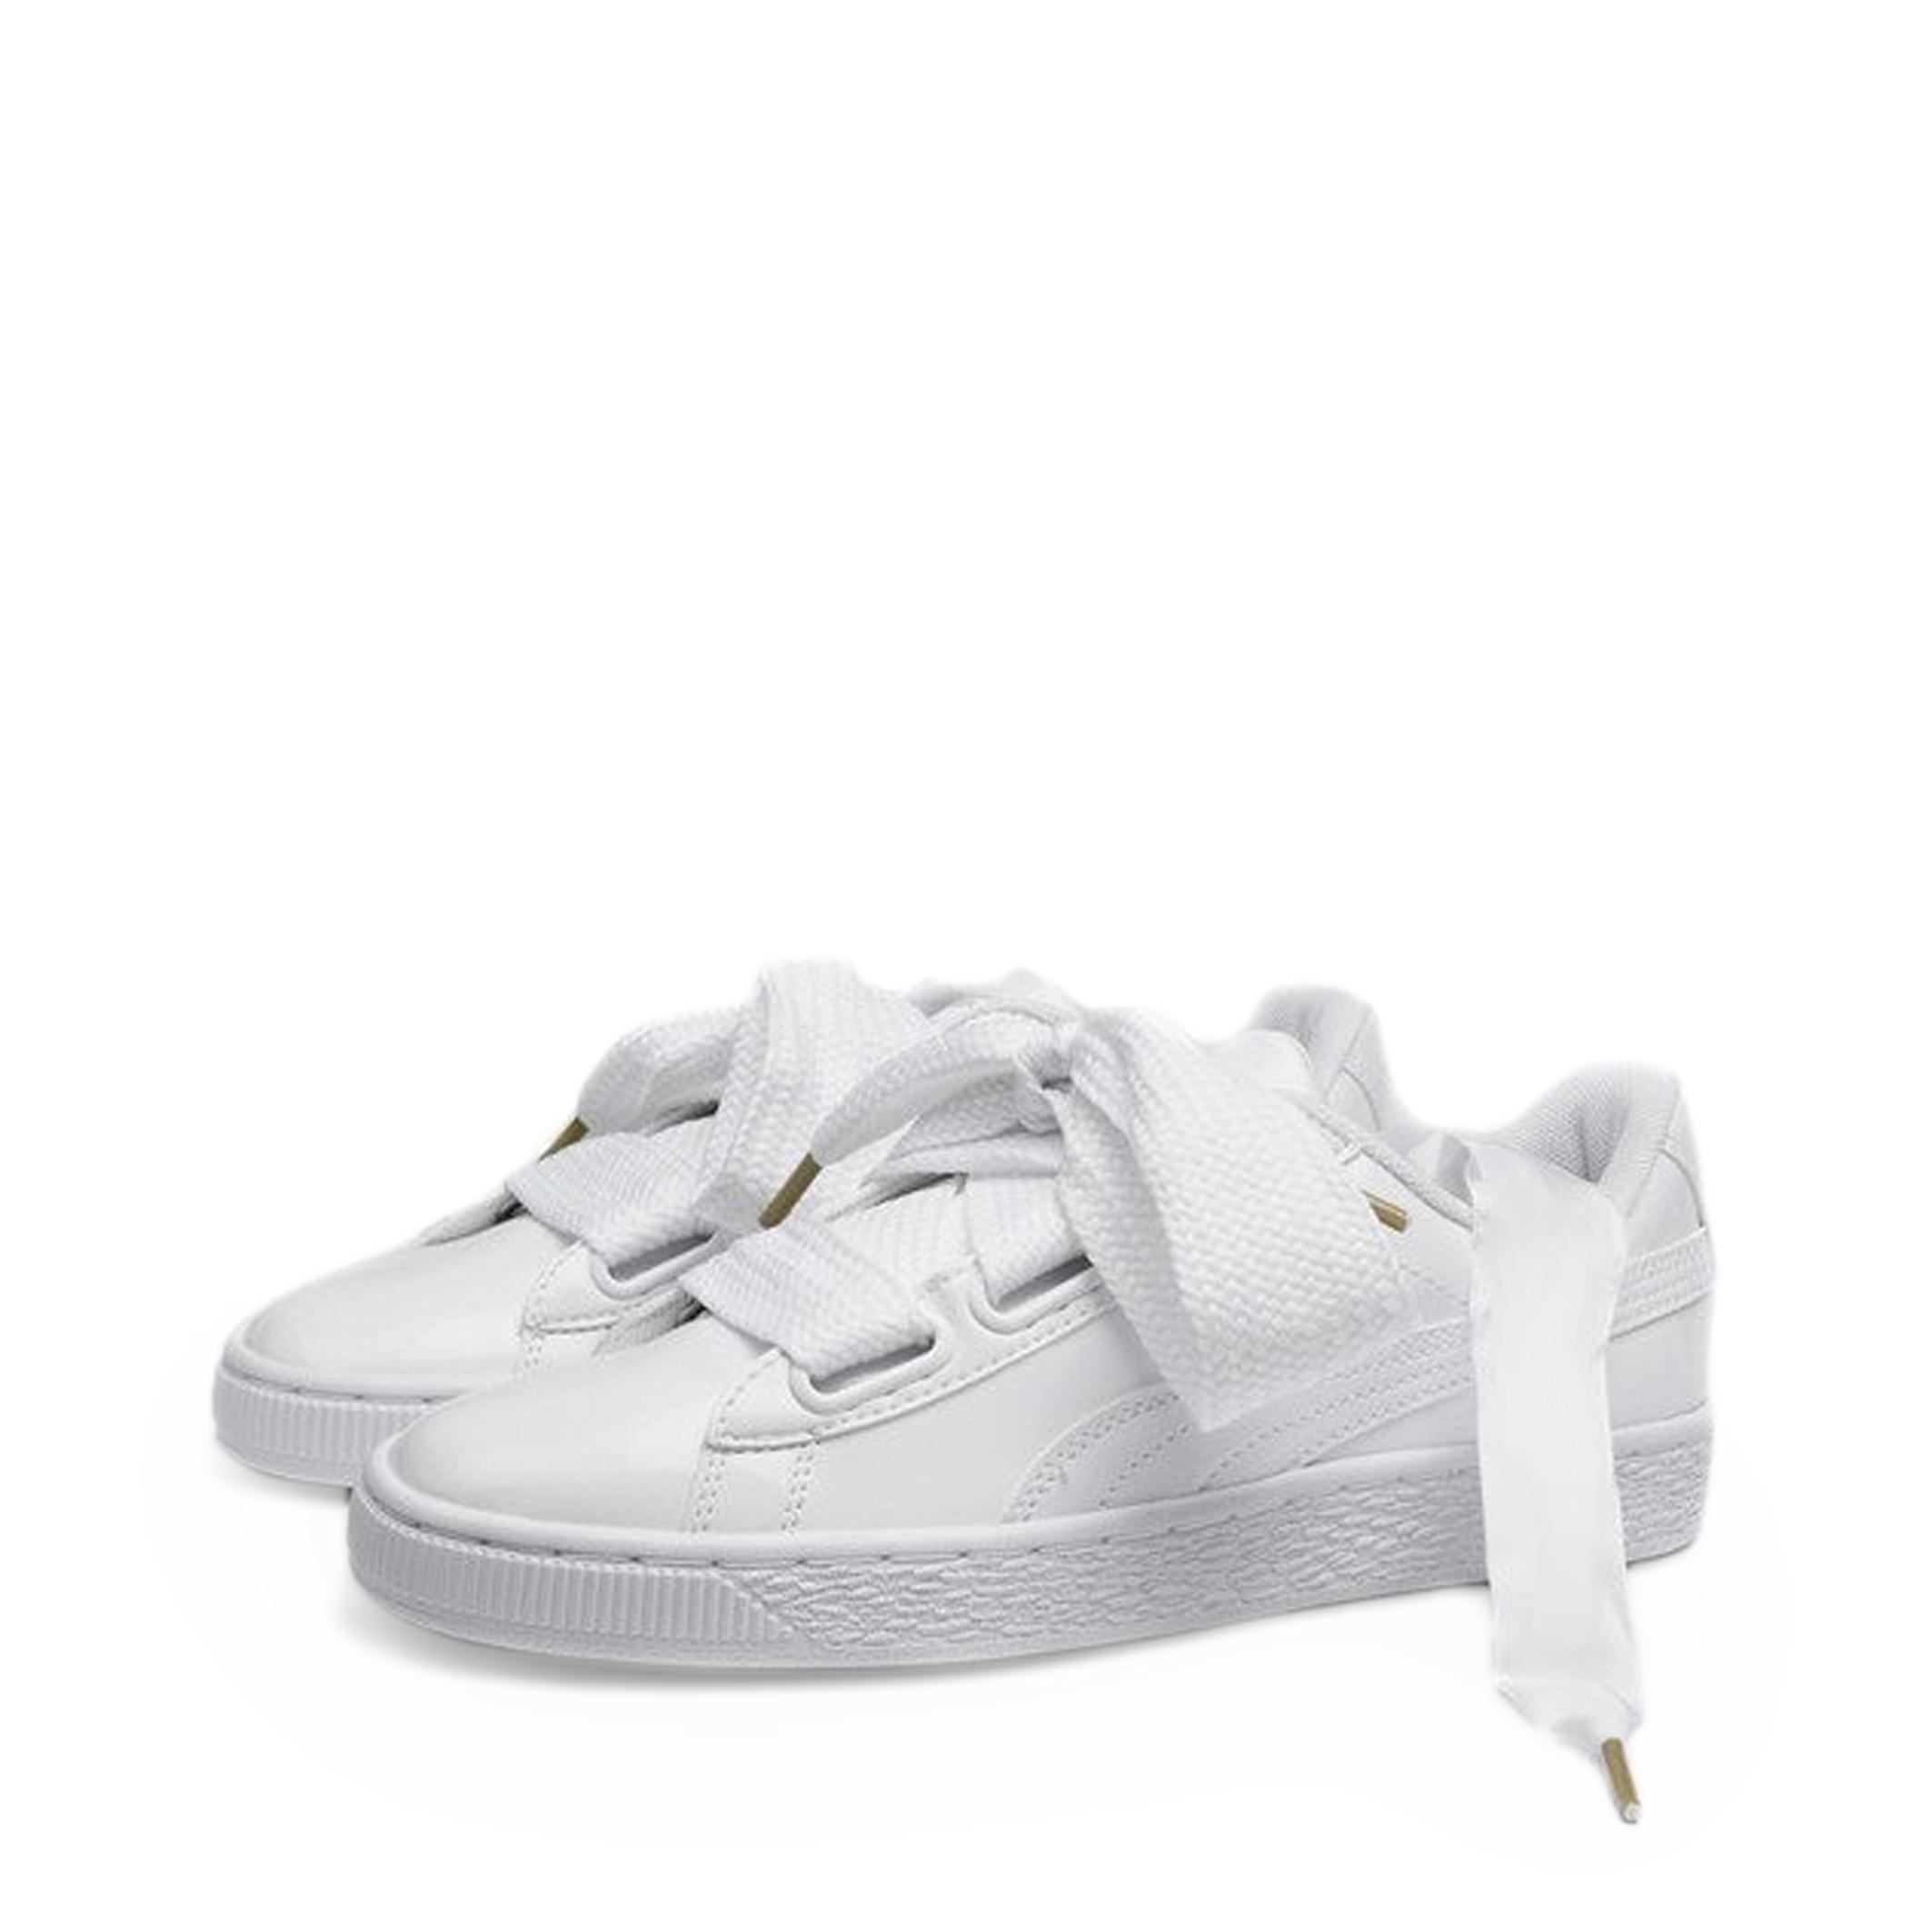 Scarpe-Puma-Donna-363073-BasketHeartPatent-Sneakers-Rosa-Bianco miniatura 3